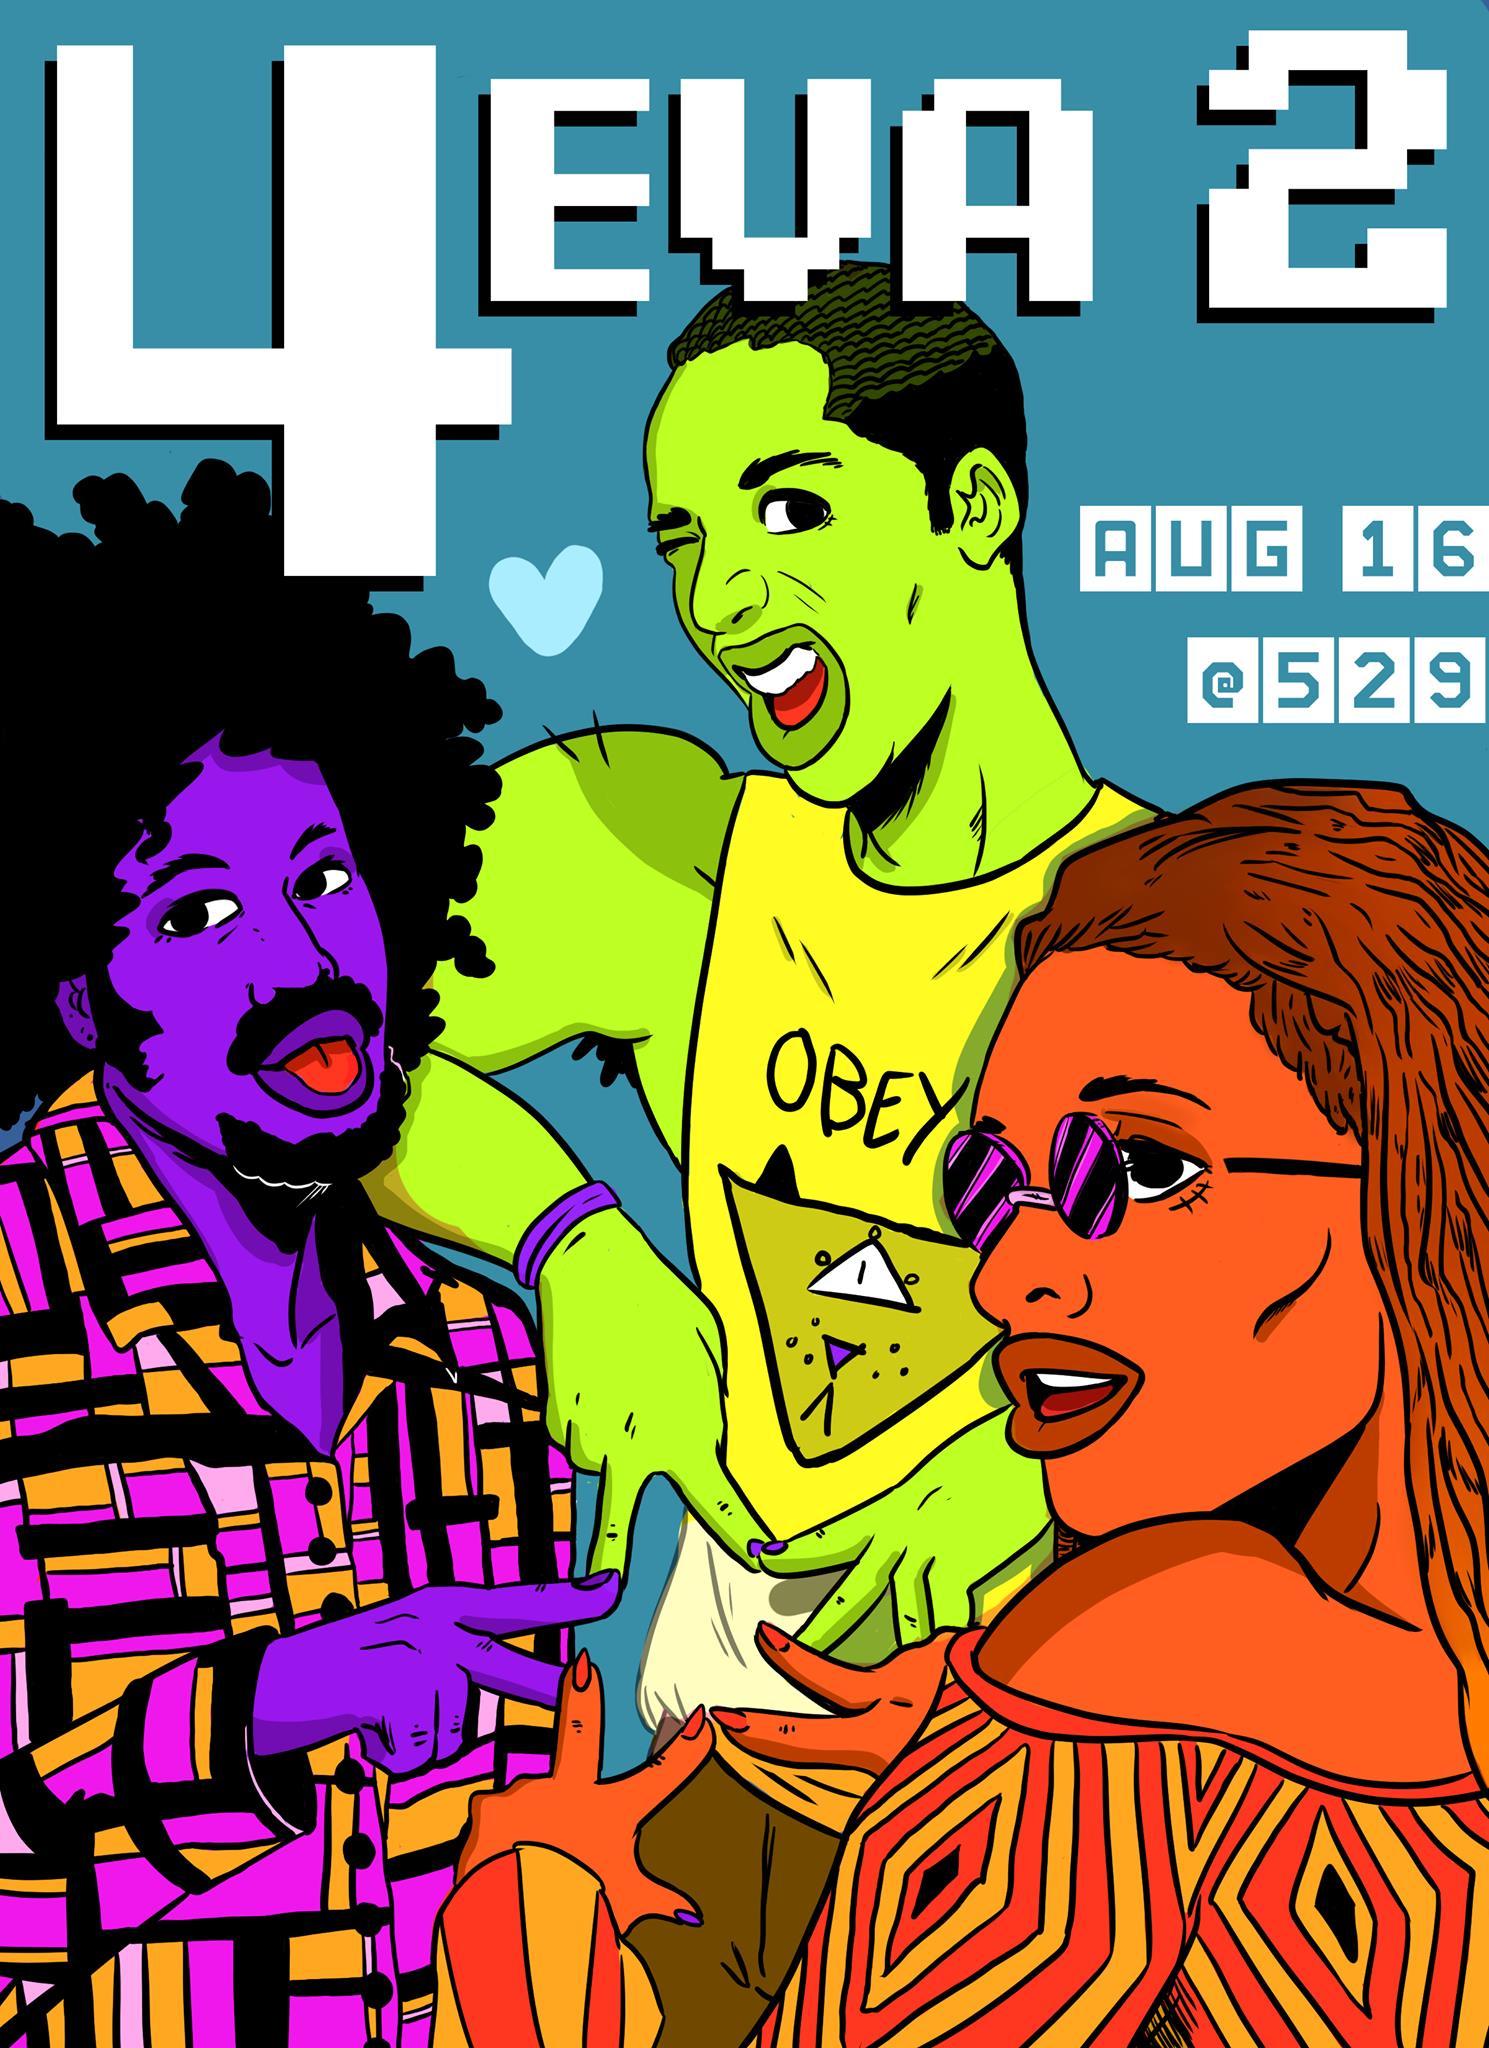 Southern Fried Queer Pride Remembers beloved Atlanta artists Kiwan Benson, Monte Qarlo, and Matt Jones this Friday.